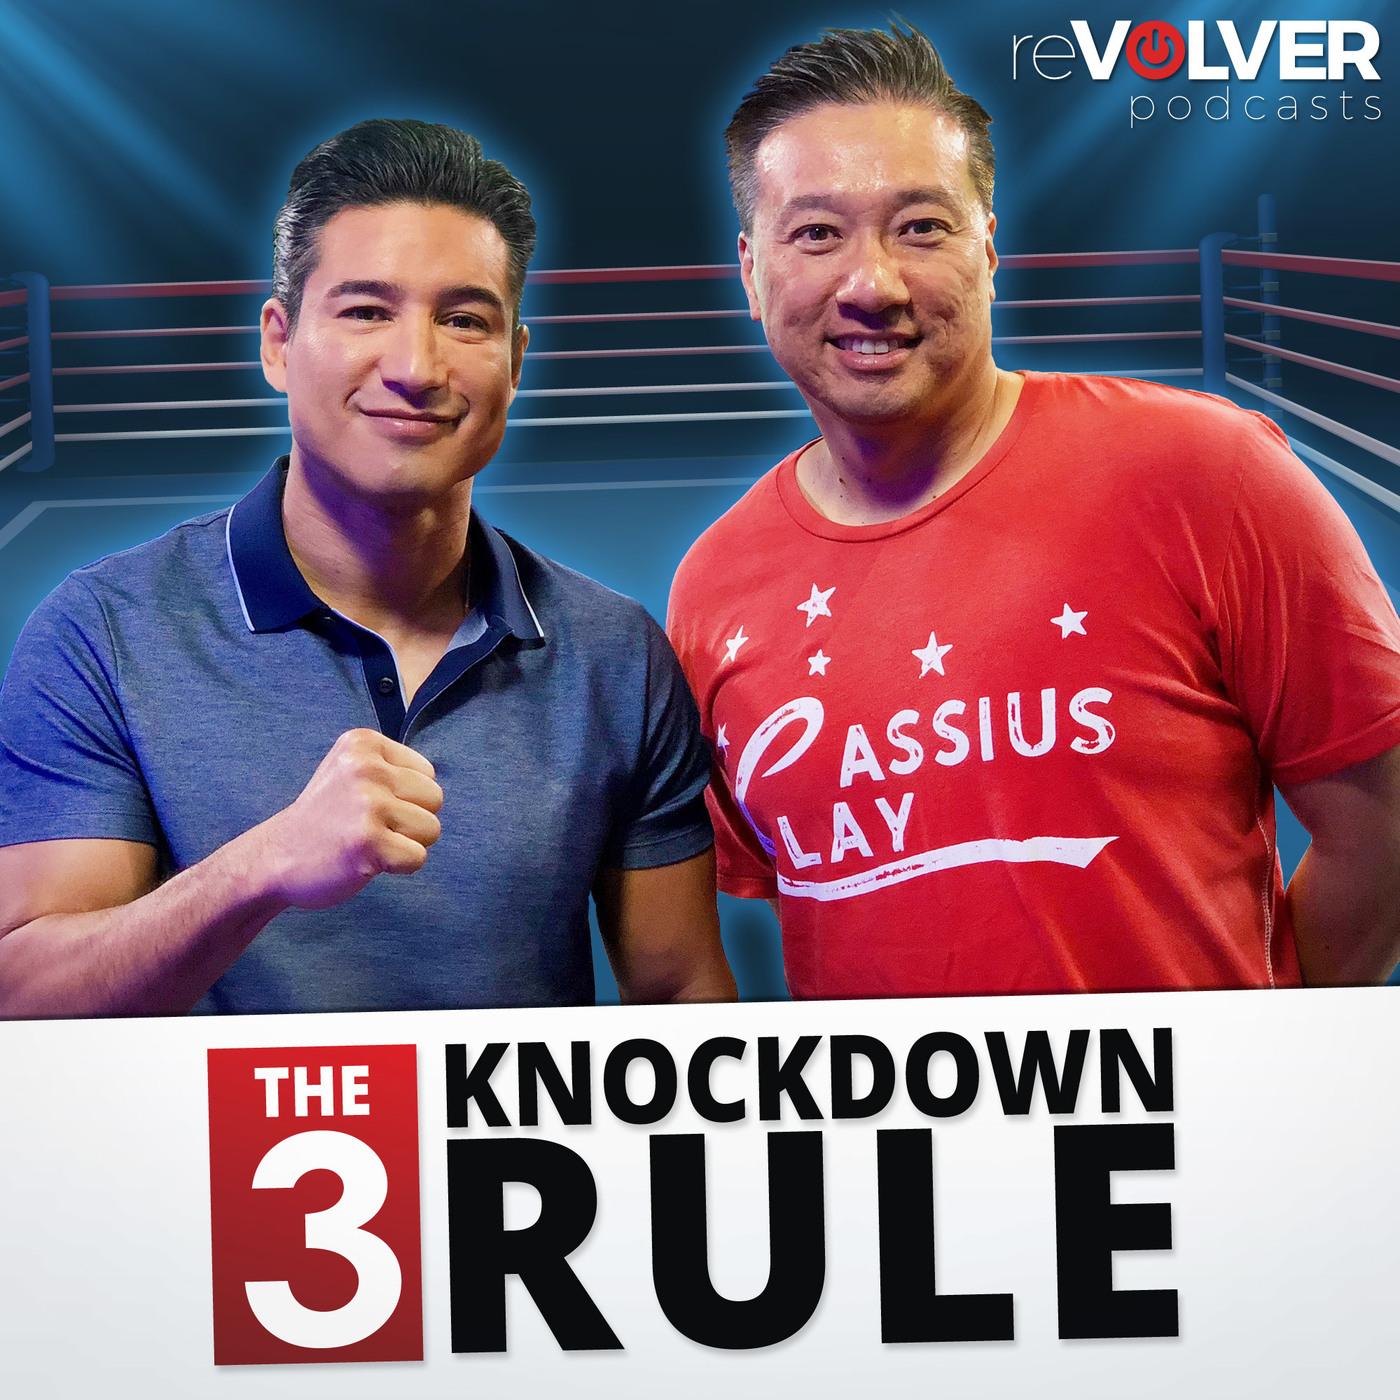 3KR: Arreola vs Kownacki recap, Vergil Ortiz fight preview, Latest on Canelo/GBP drama and more!